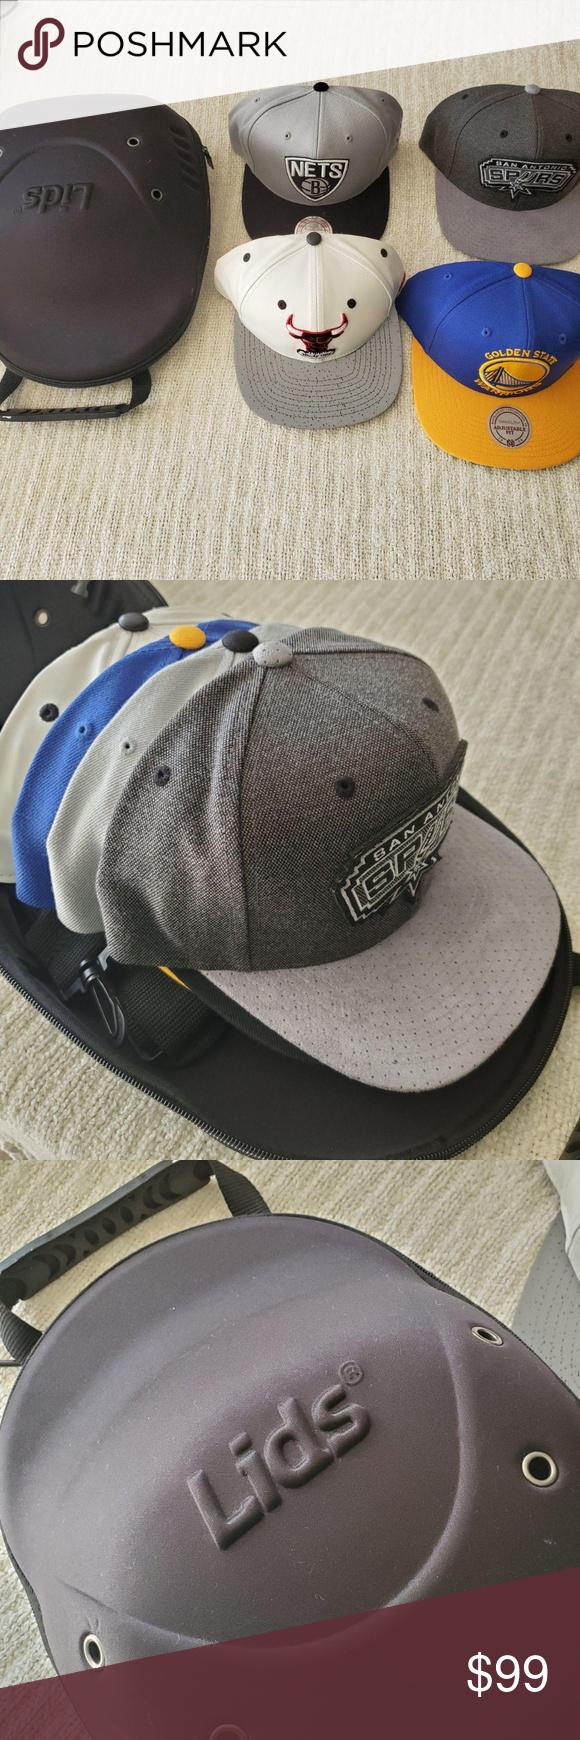 Lids Baseball Cap Carrier Black Case 4 Hats Black Case Branding Shop Baseball Cap